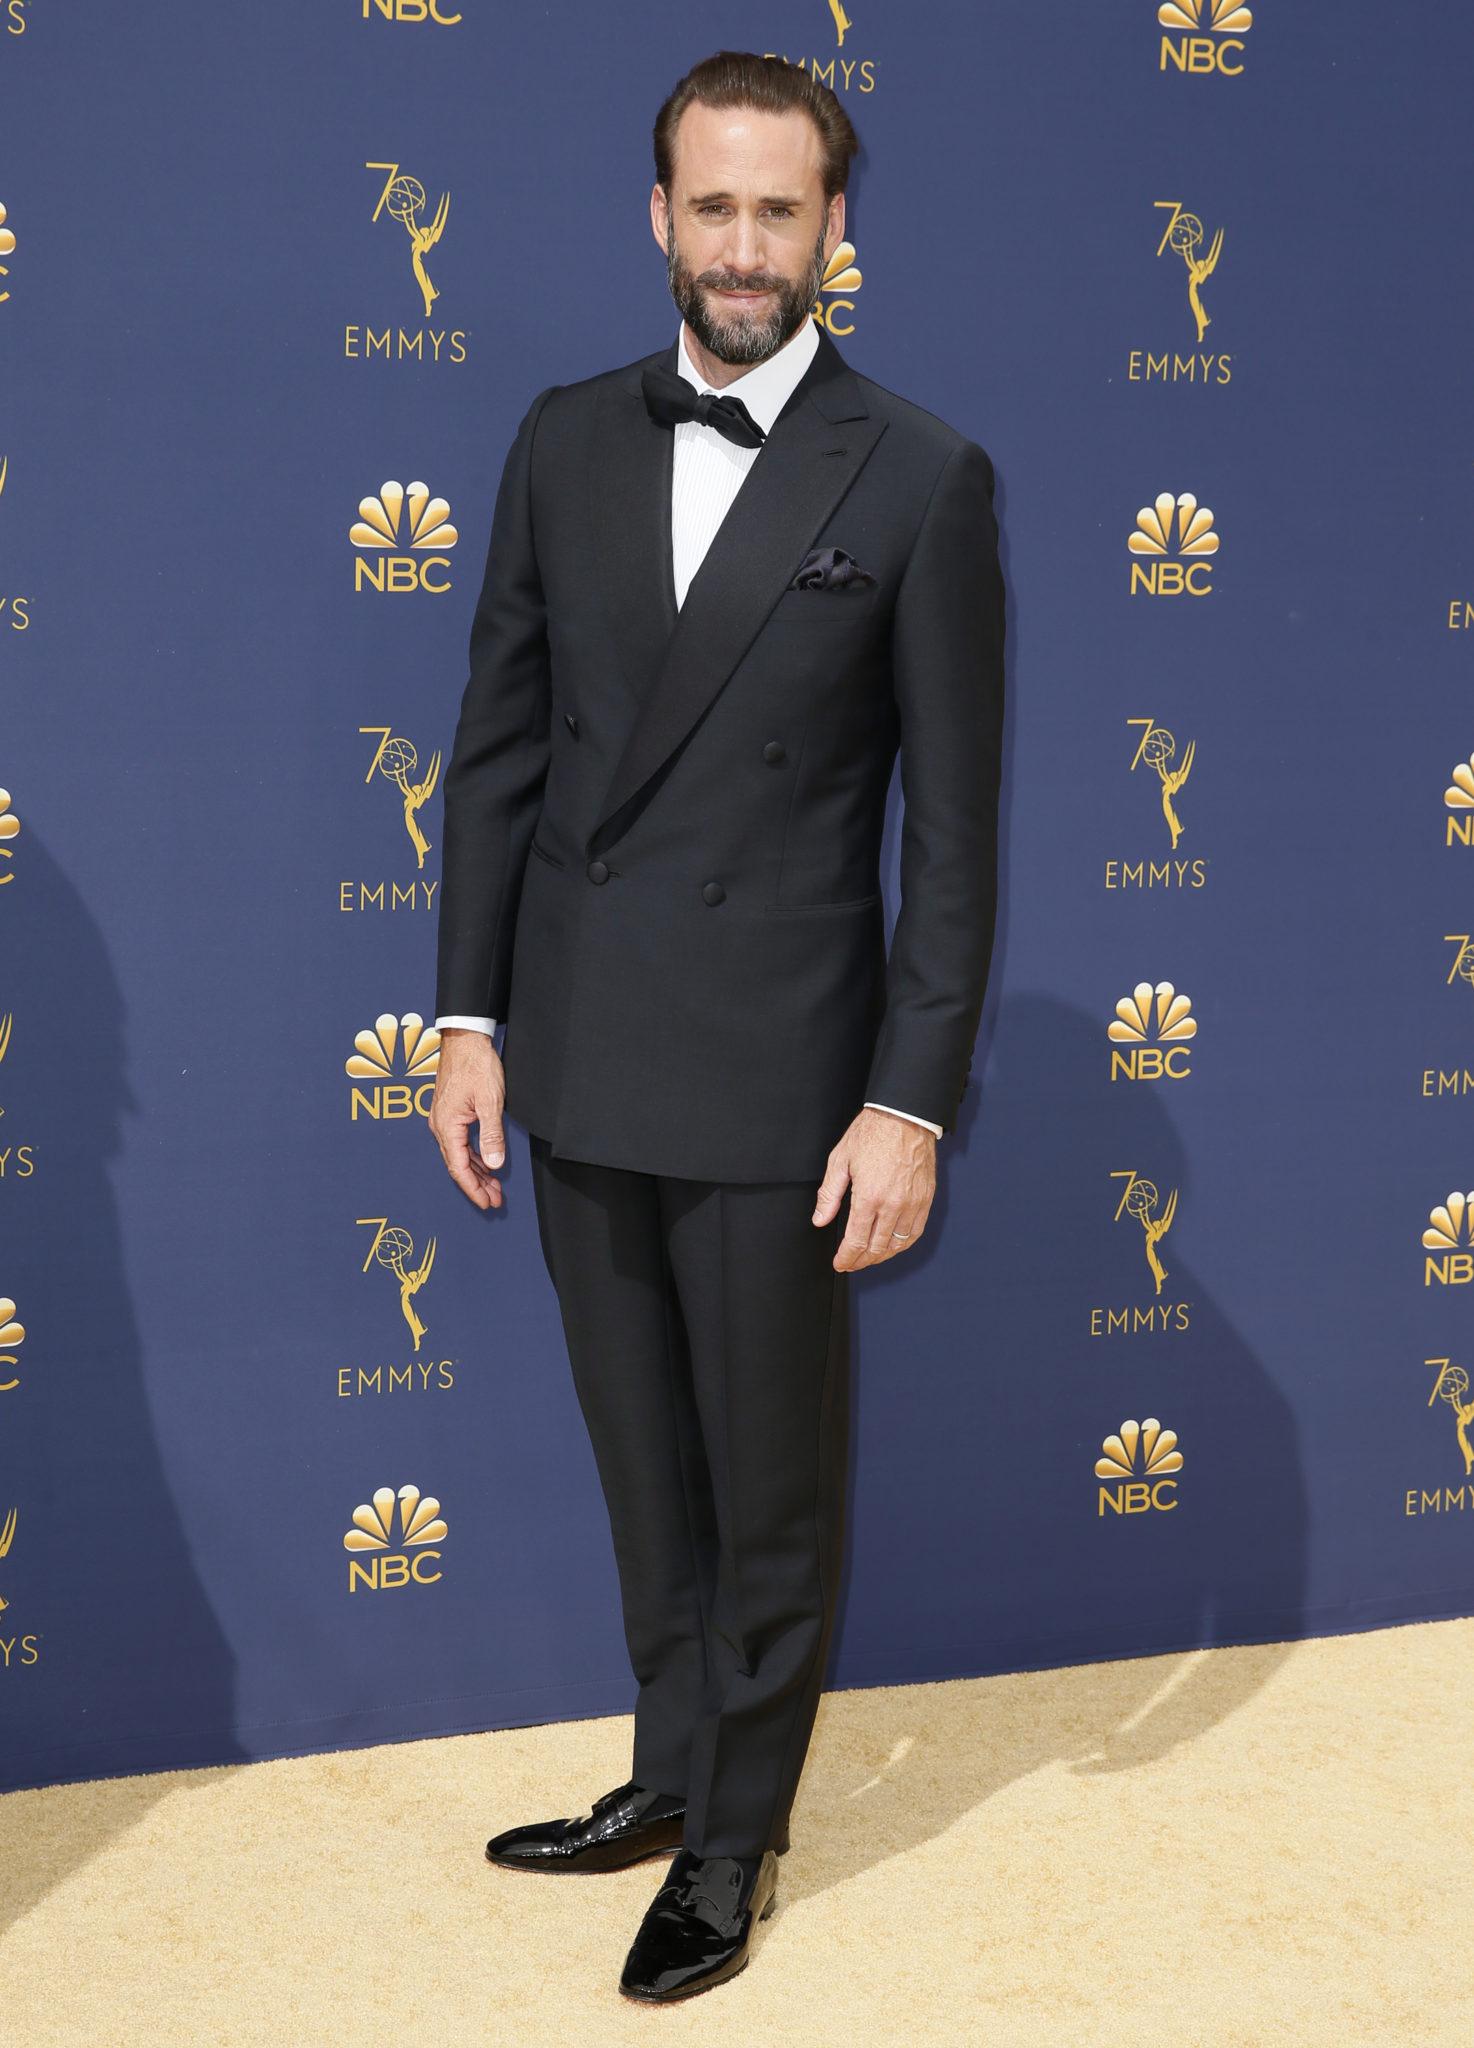 Joseph Fiennes Emmys 4Chion Lifestyle